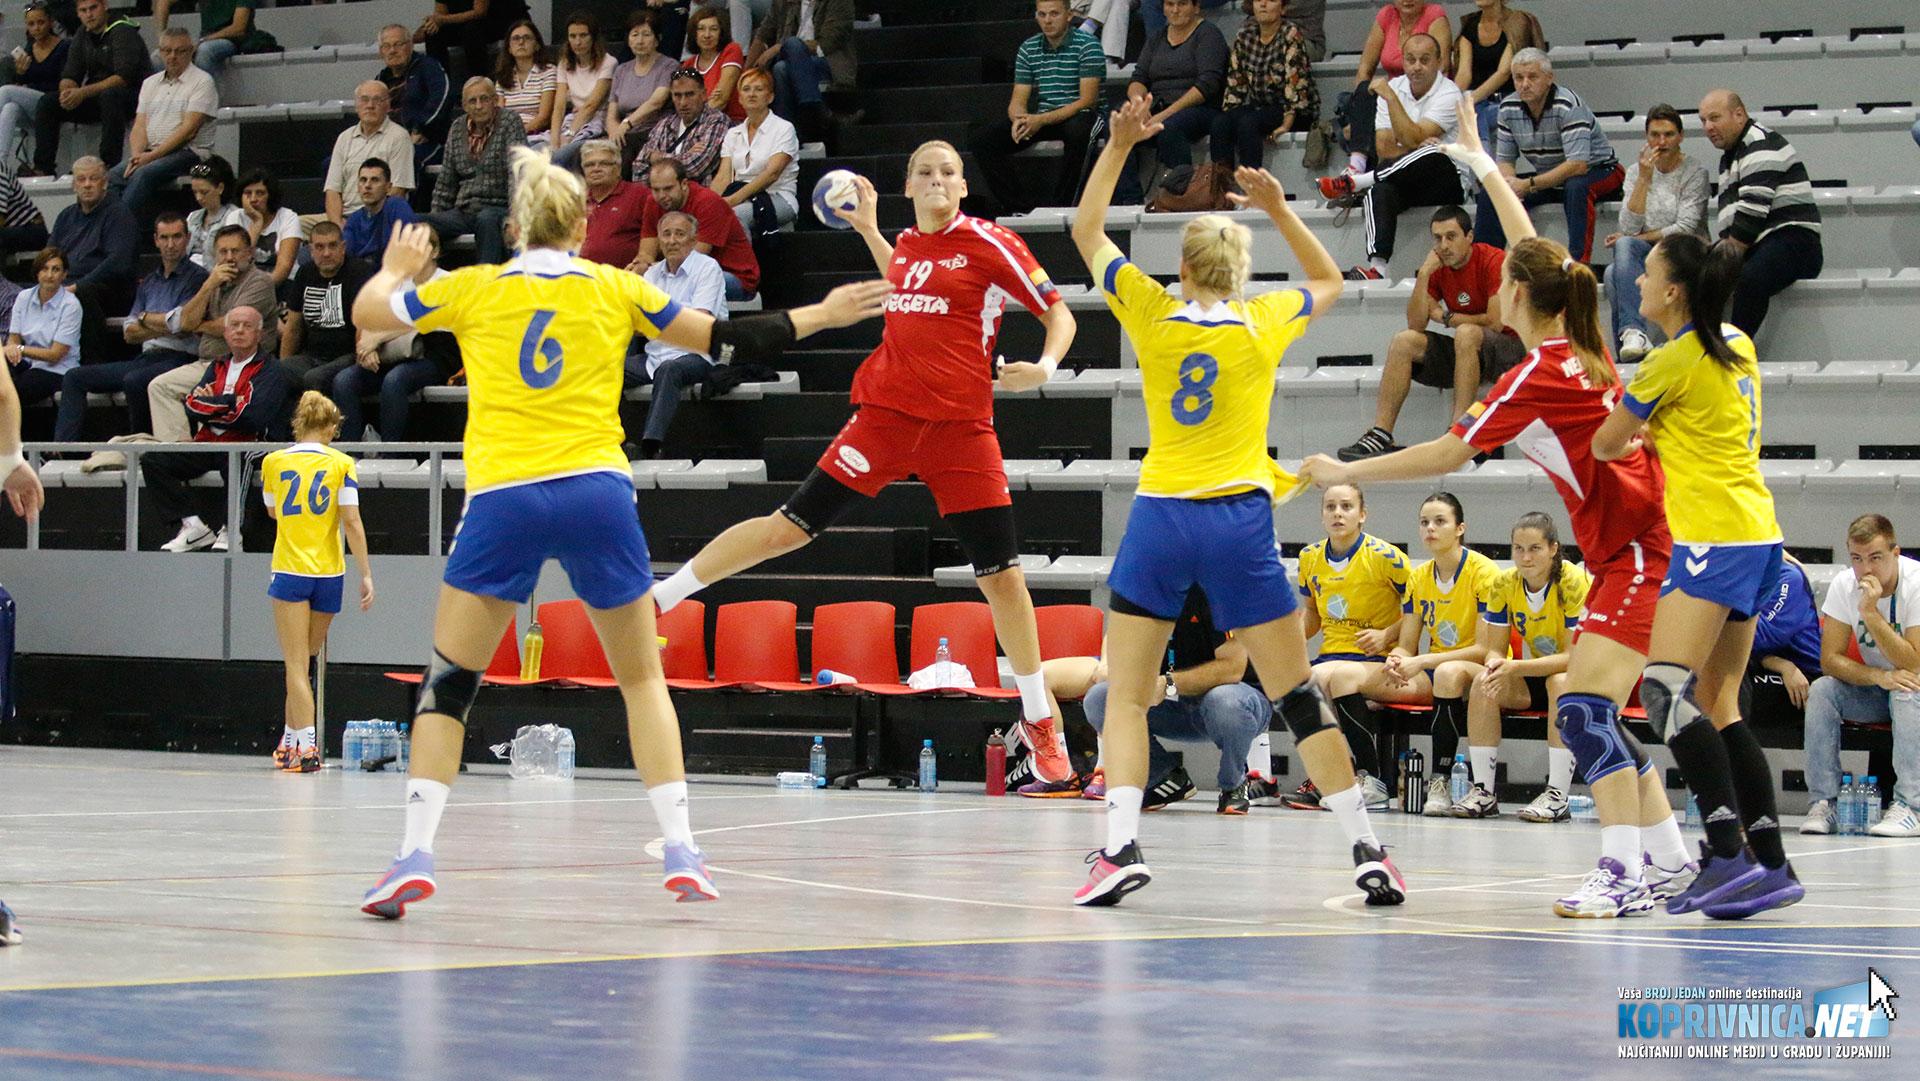 Lana Franković zabila je dva gola svojoj bivšoj ekipi // Foto: Mario Kos